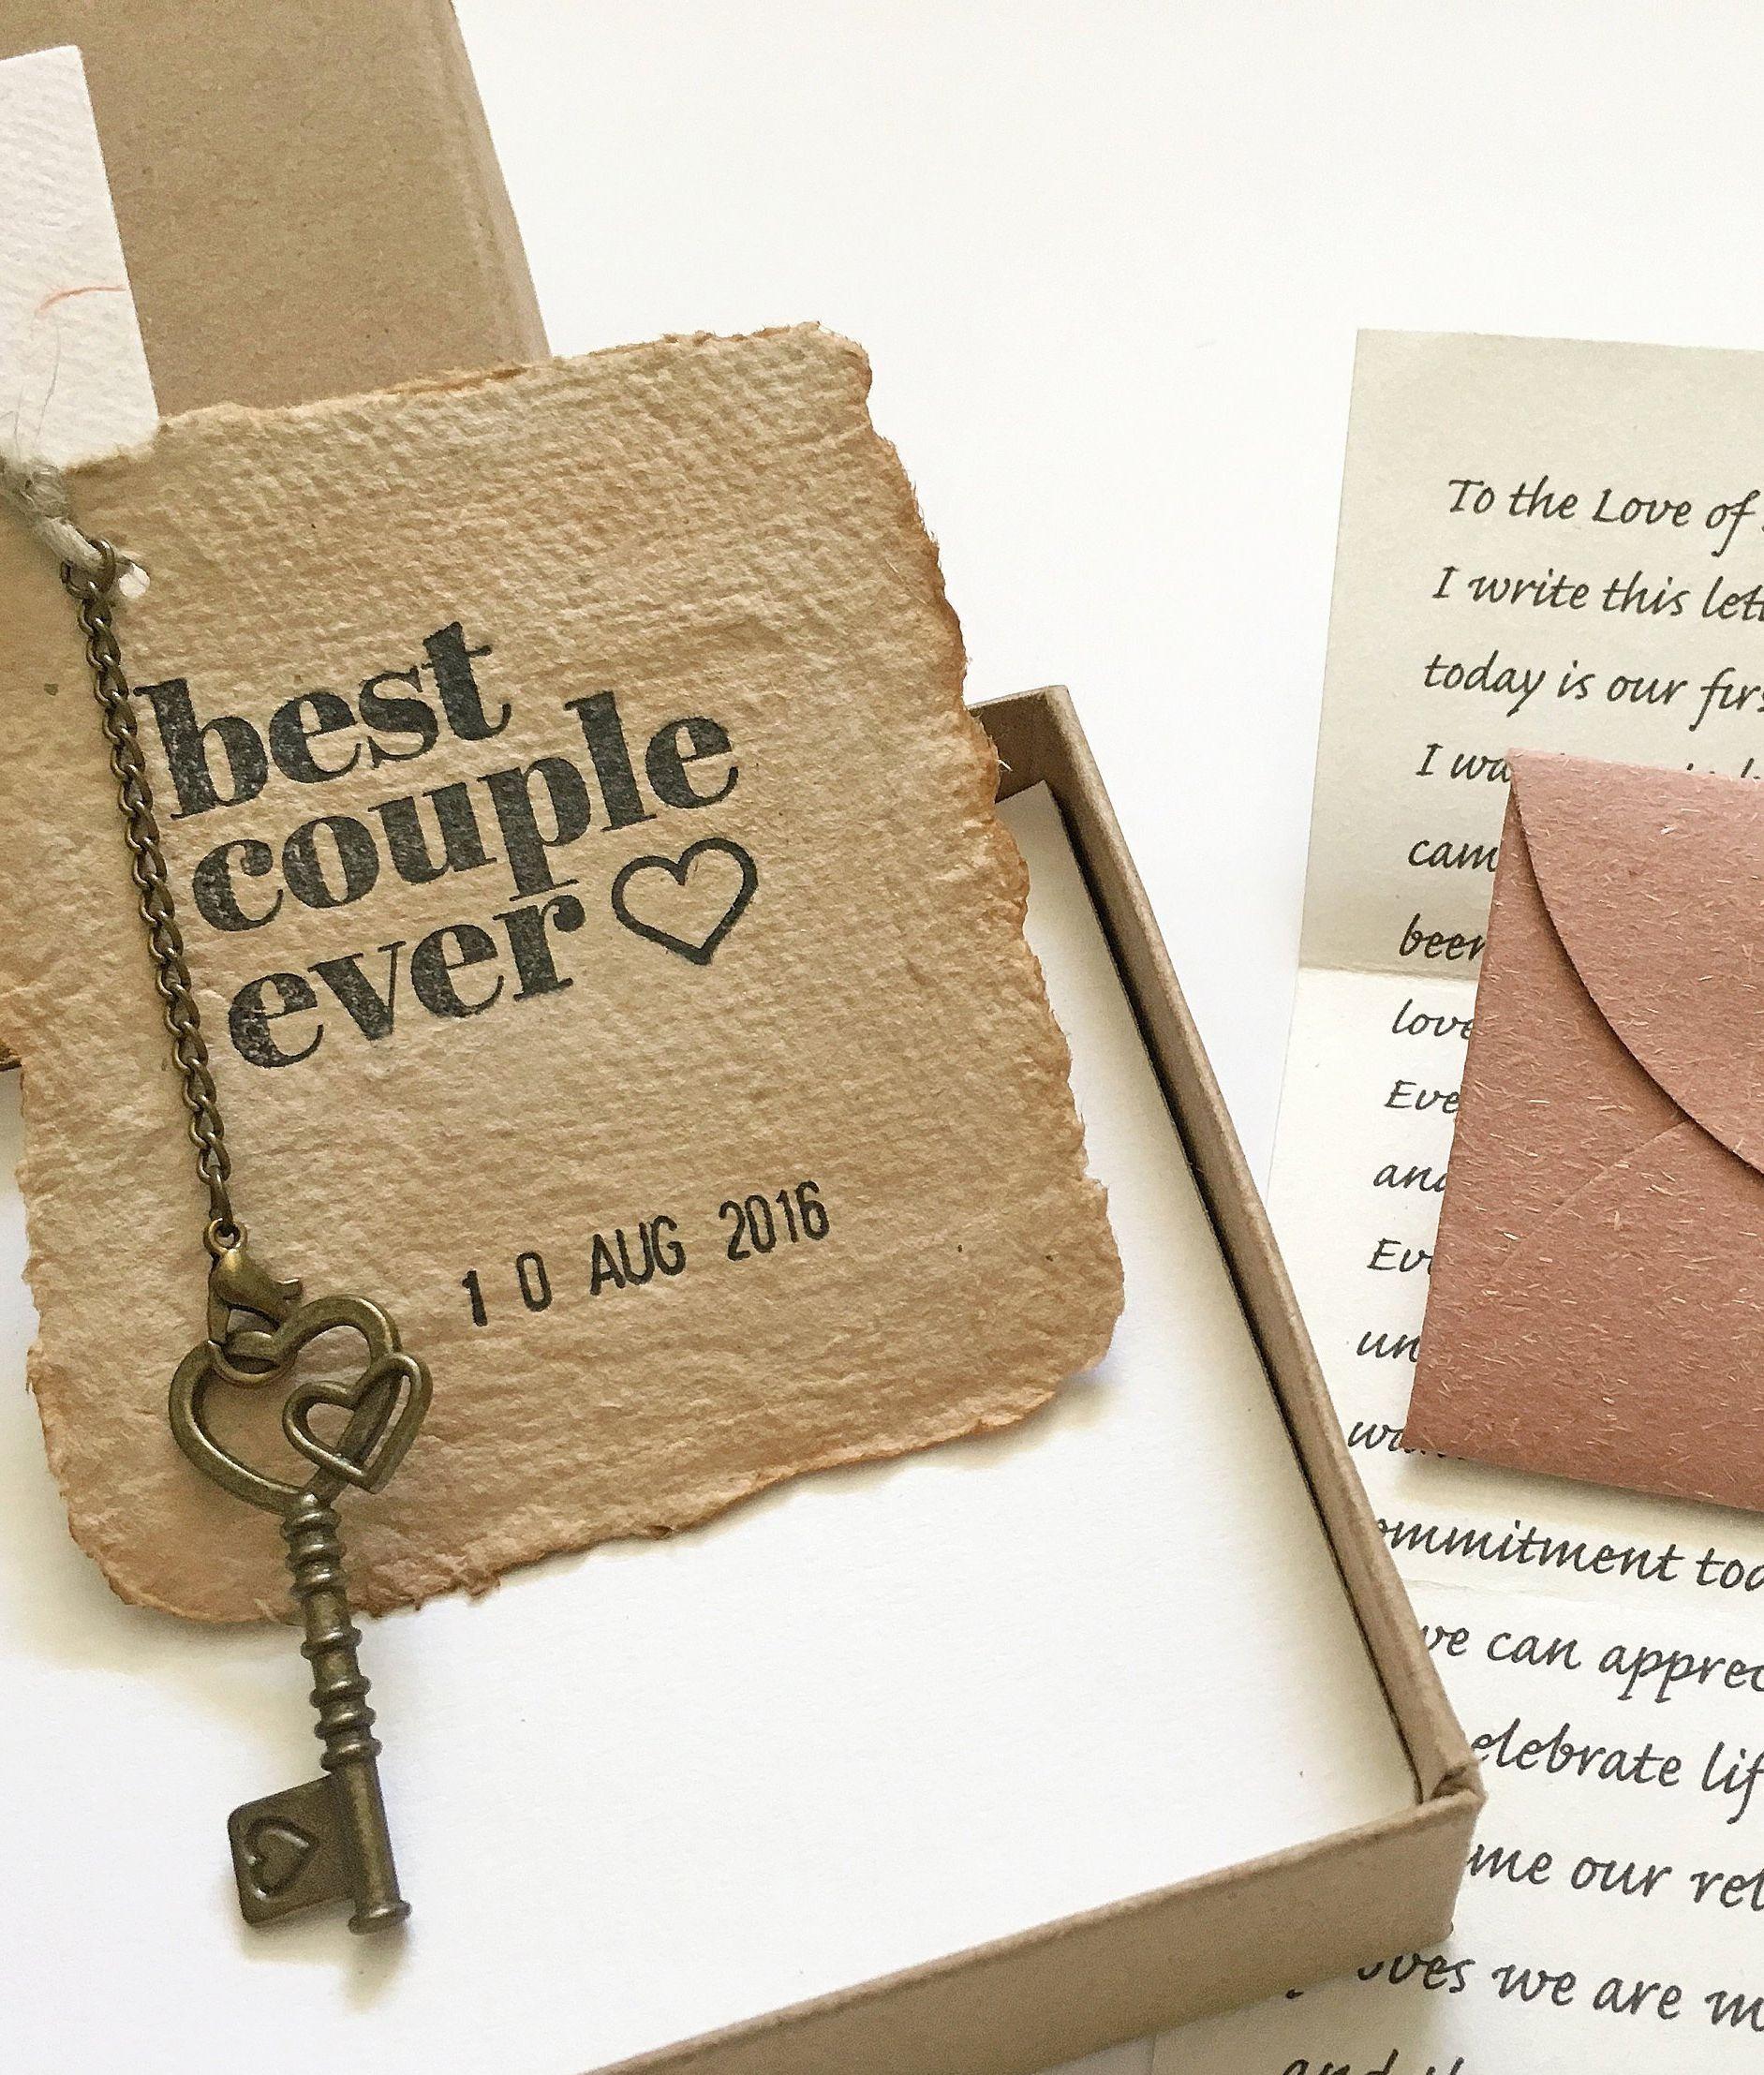 Sustainable Paper Anniversary Gift Personalized Love Letter Etsy Paper Gifts Anniversary Paper Anniversary One Year Anniversary Gifts